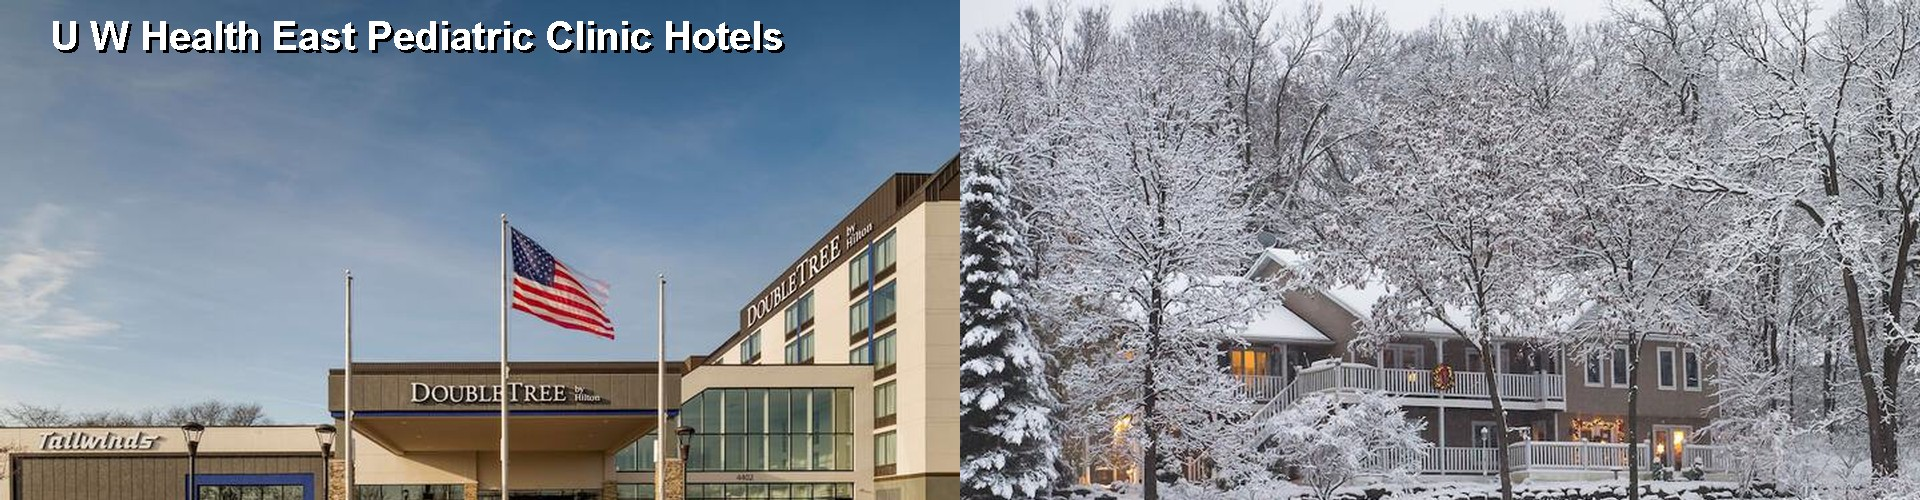 48 Hotels Near U W Health East Pediatric Clinic In Madison Wi